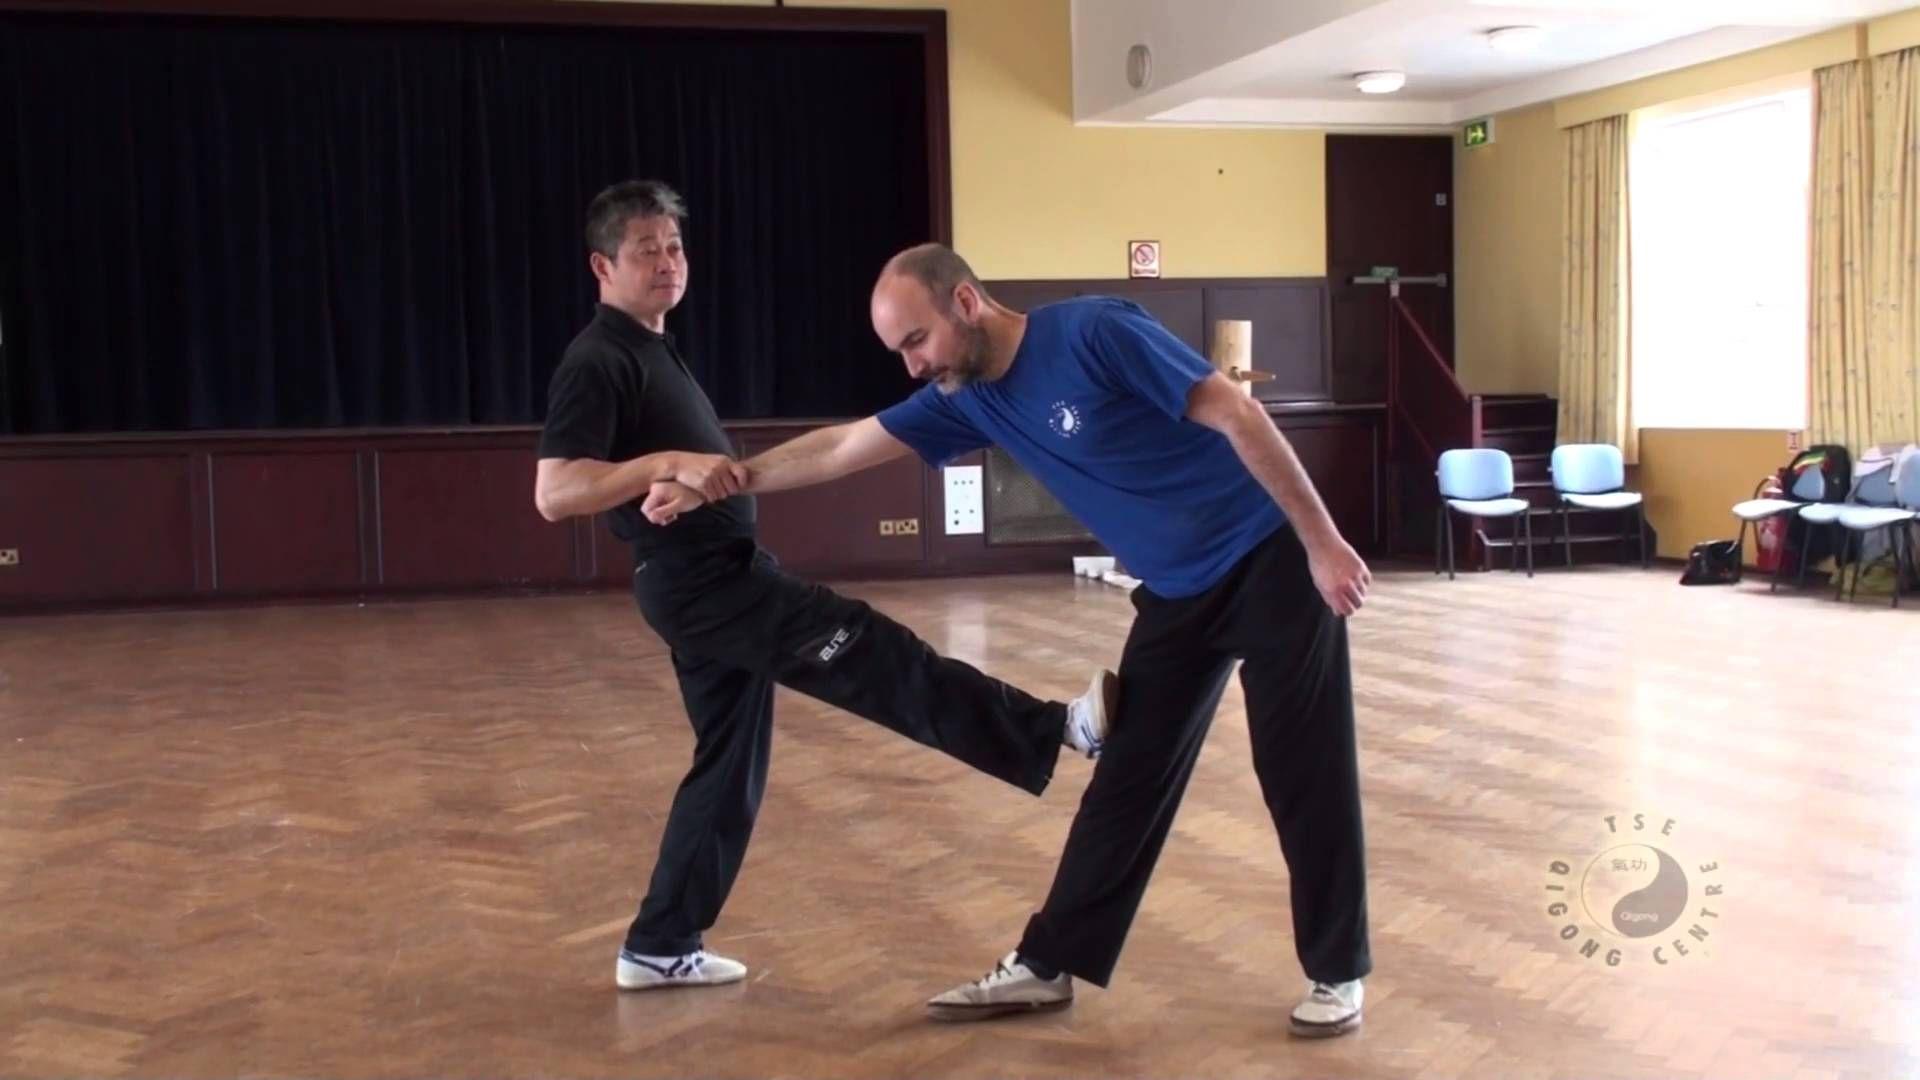 Wing chun martial arts, Martial arts techniques, Wing chun